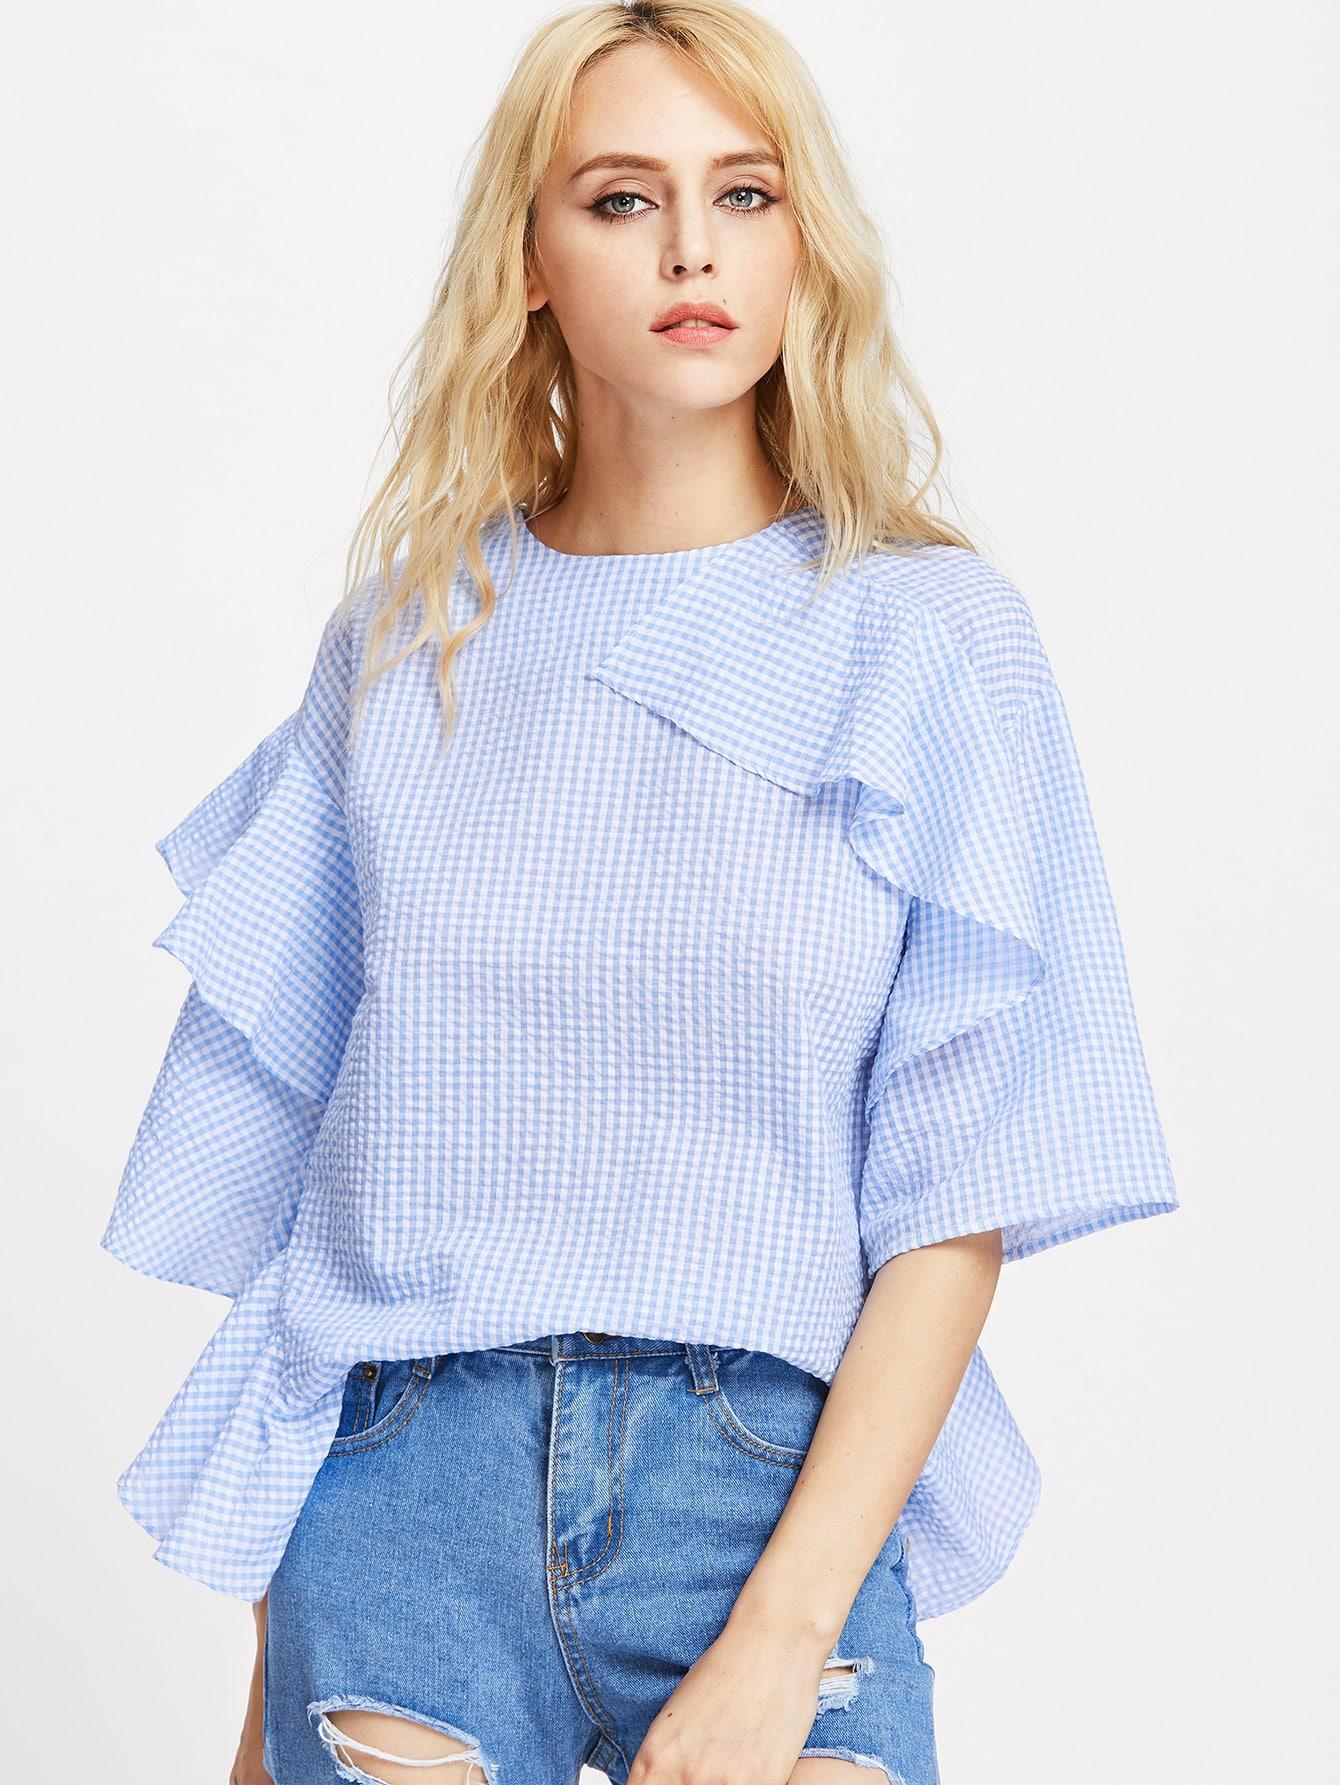 blouse170330456_2